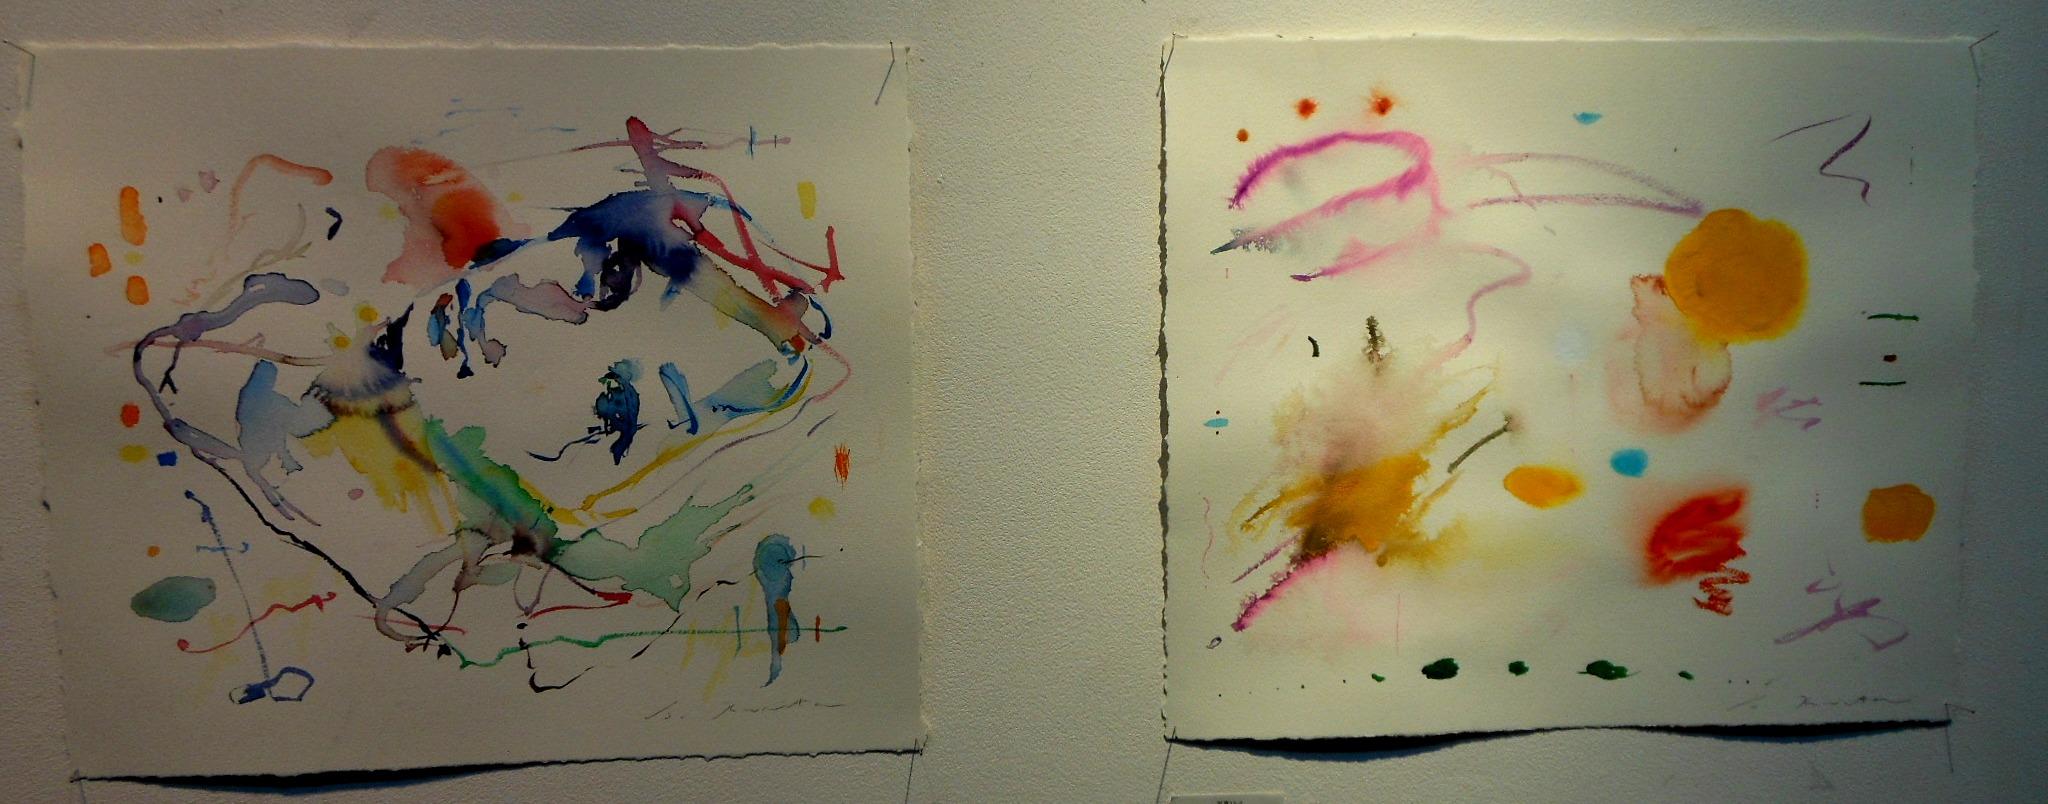 1650) 「栗田健・絵画展 『Portrait』」 af 終了・2月21日(火)~3月5日(月)_f0126829_20531834.jpg